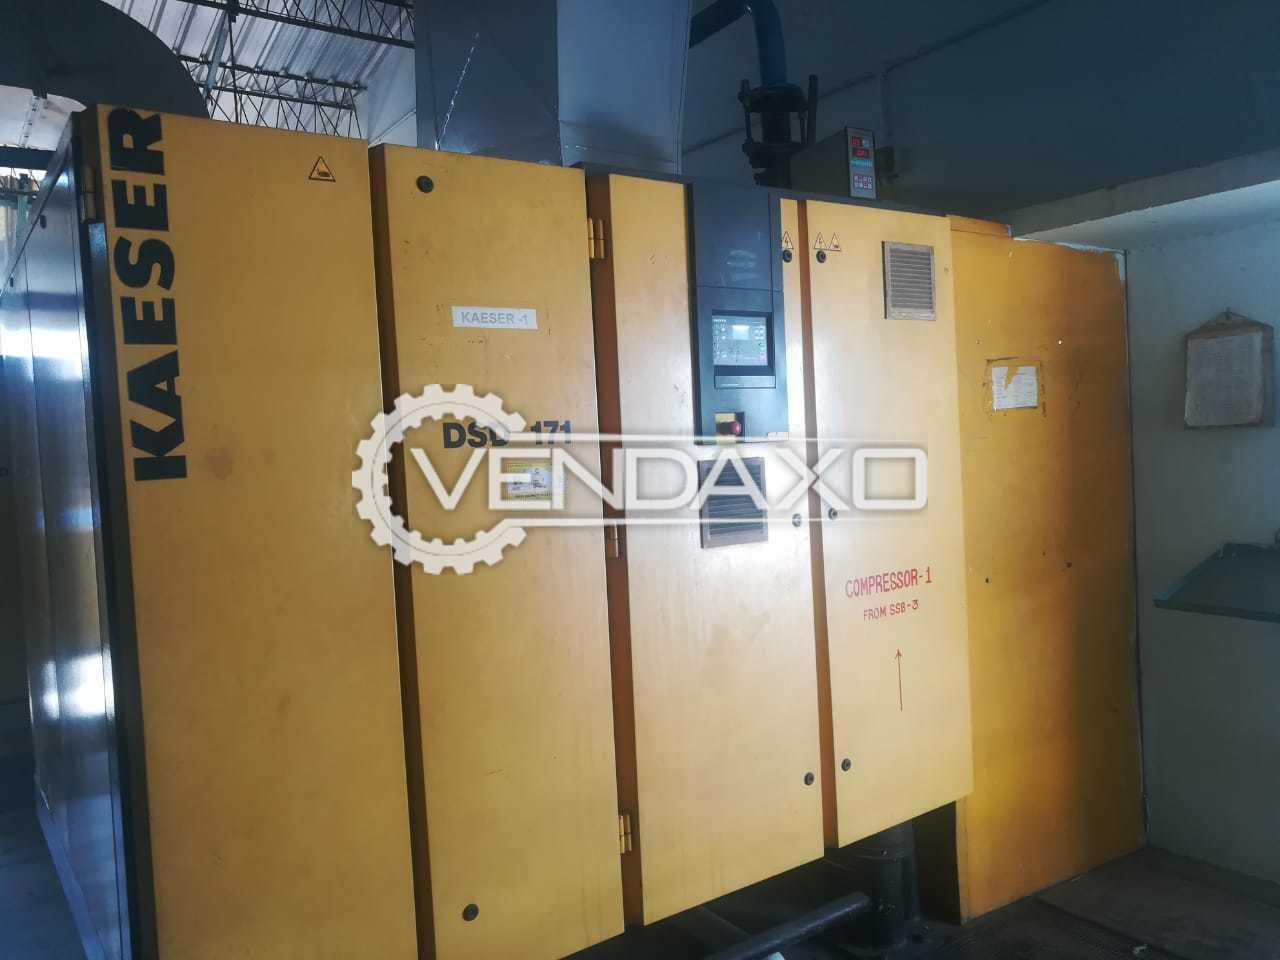 Kaeser DSD 171 Air Compressor - 120 HP